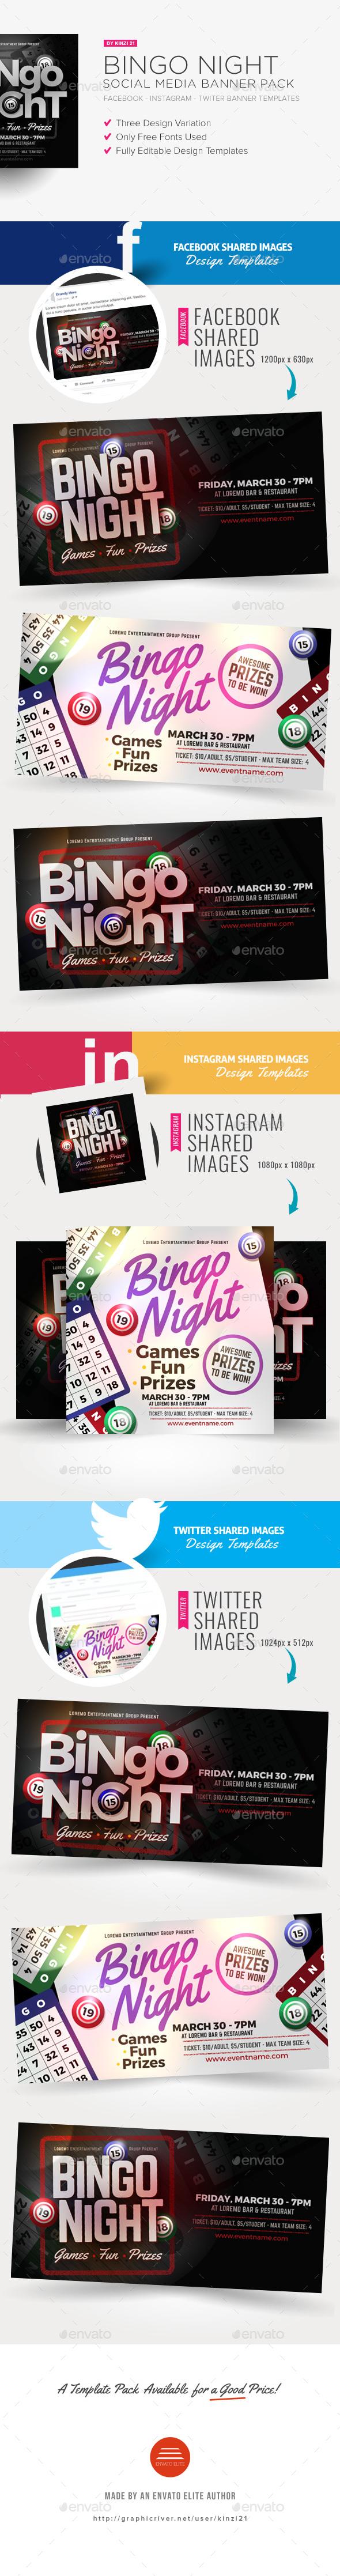 Bingo Night Social Media Banner Pack - Social Media Web Elements